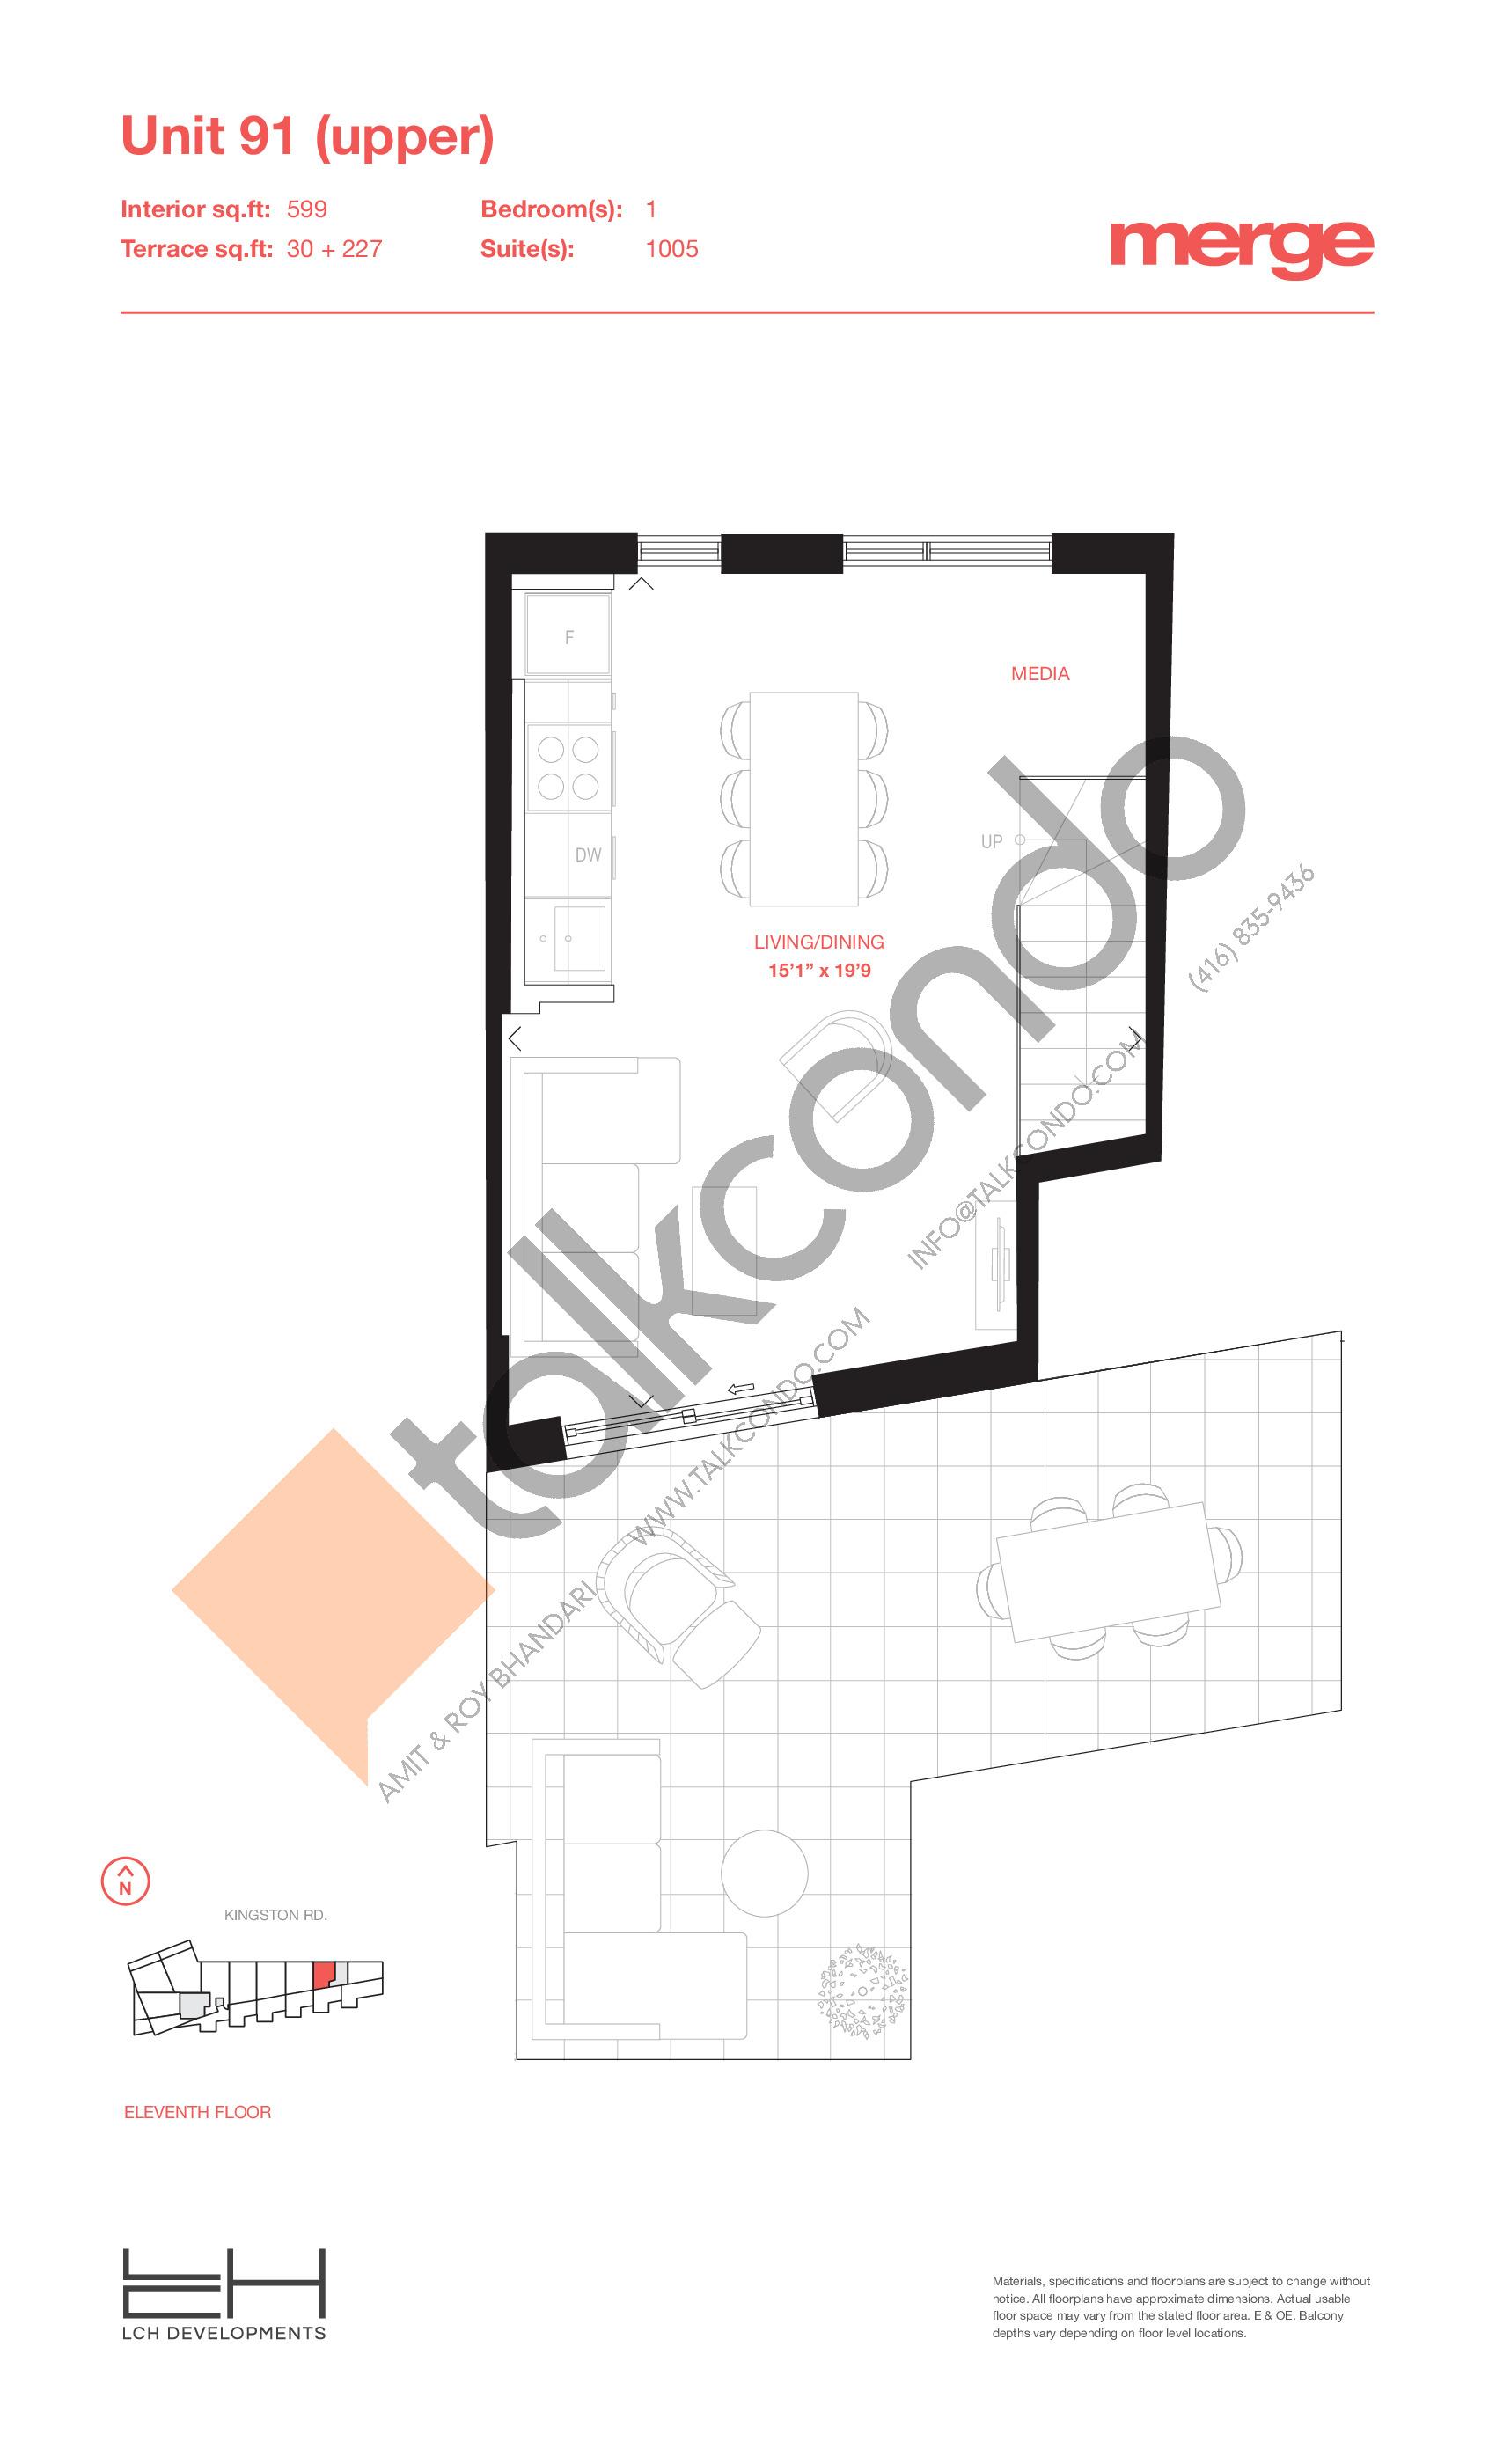 Unit 91 (Upper) - 2 Storey Floor Plan at Merge Condos - 599 sq.ft